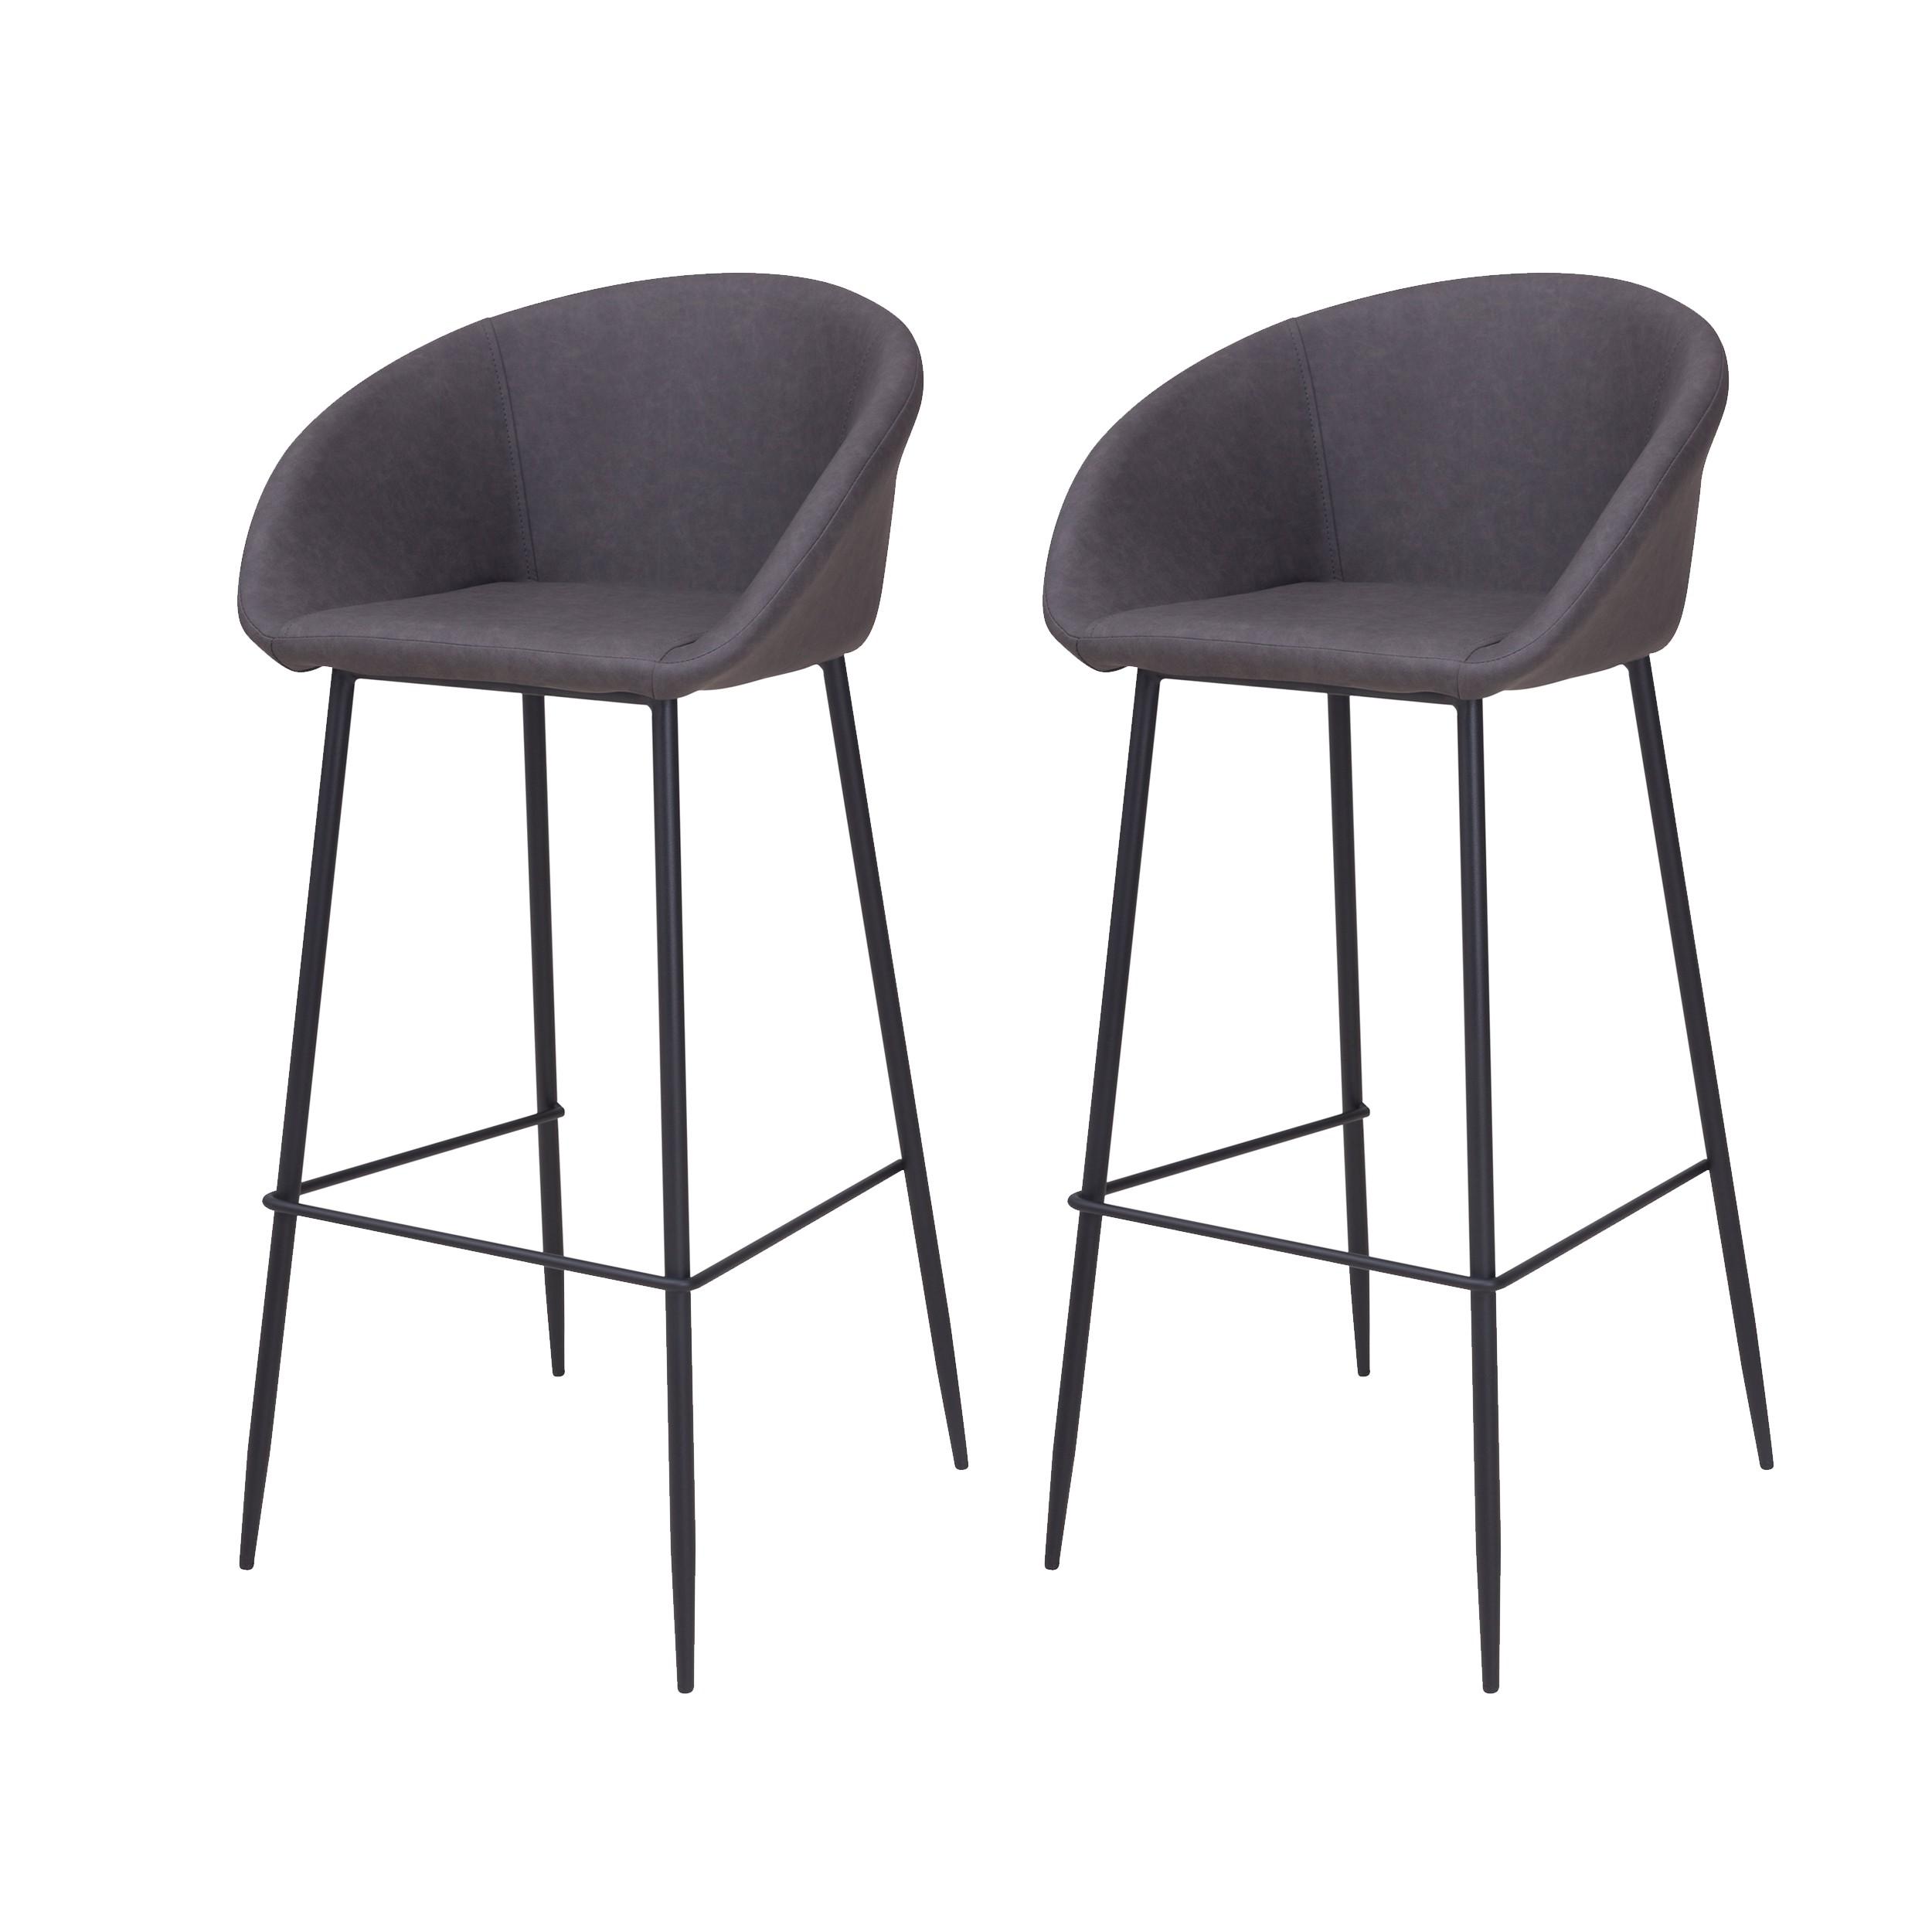 acheter chaise de bar gris fonce